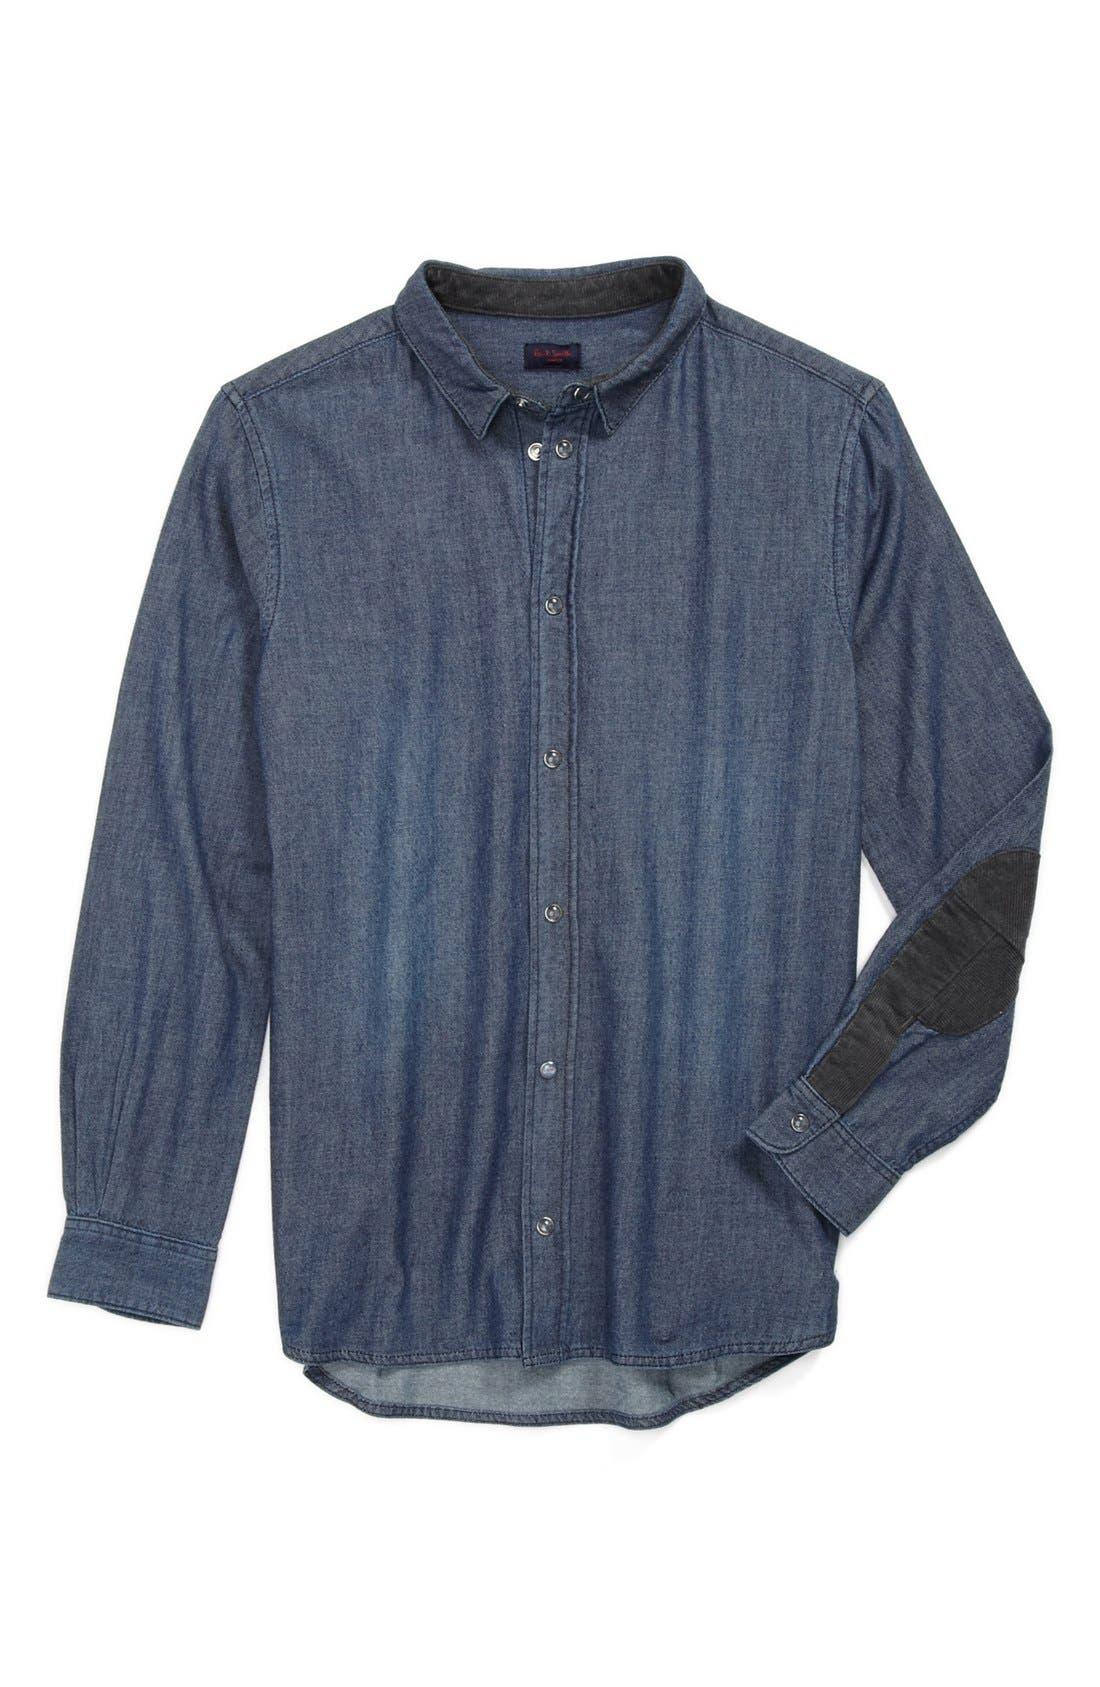 Main Image - Paul Smith Junior 'Enock' Denim Shirt (Toddler Boys)